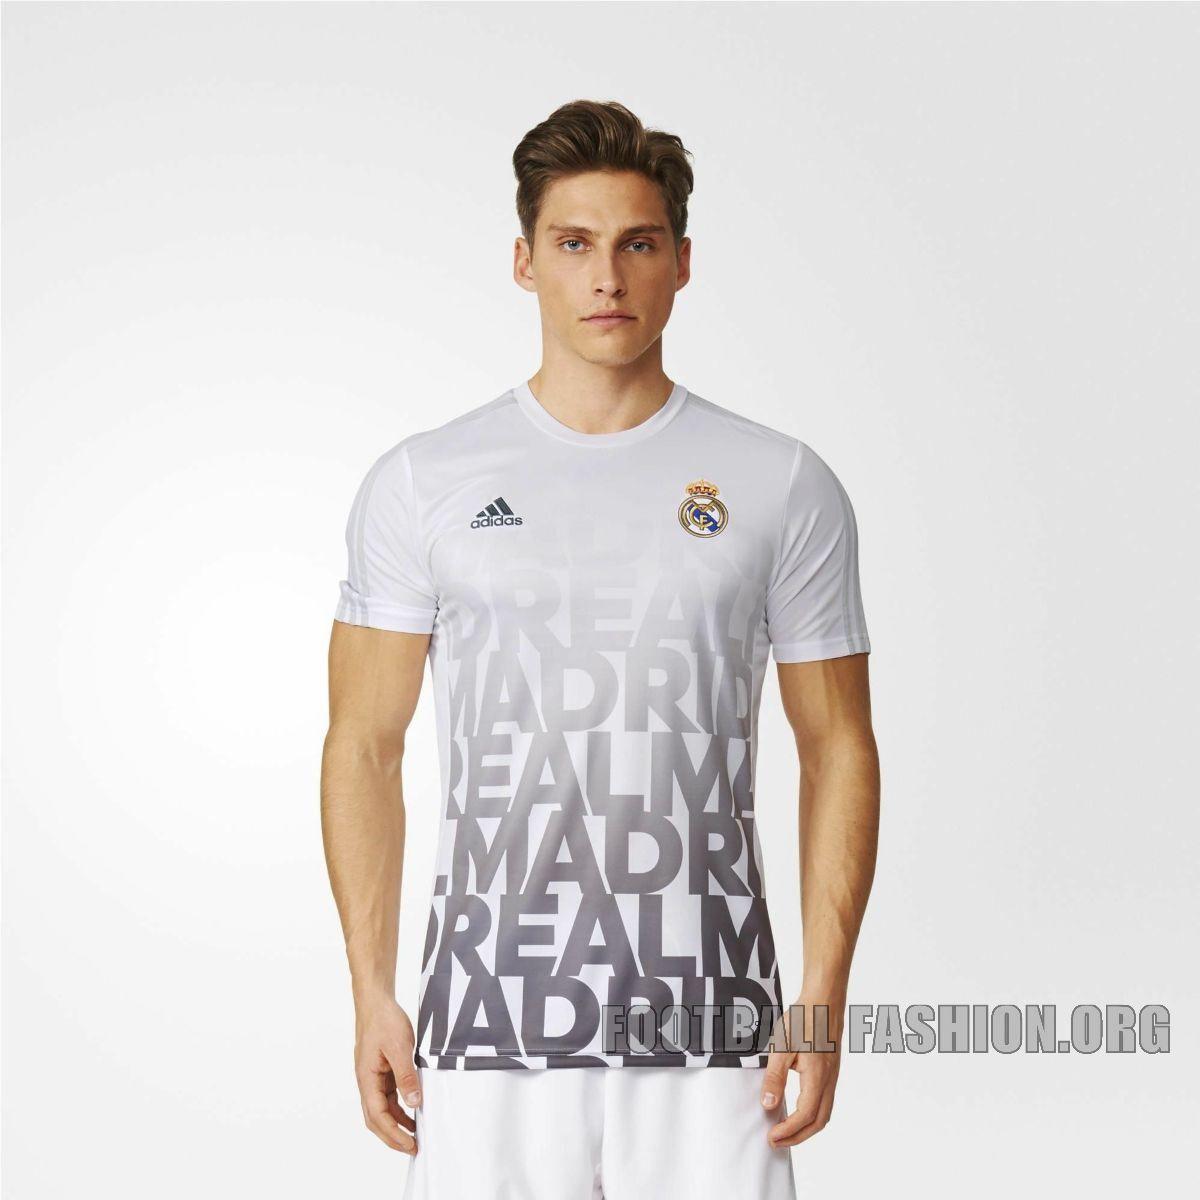 Real Madrid 2016 Adidas Pre Match Jersey Football Fashion Org Real Madrid Madrid Athletic Shirts